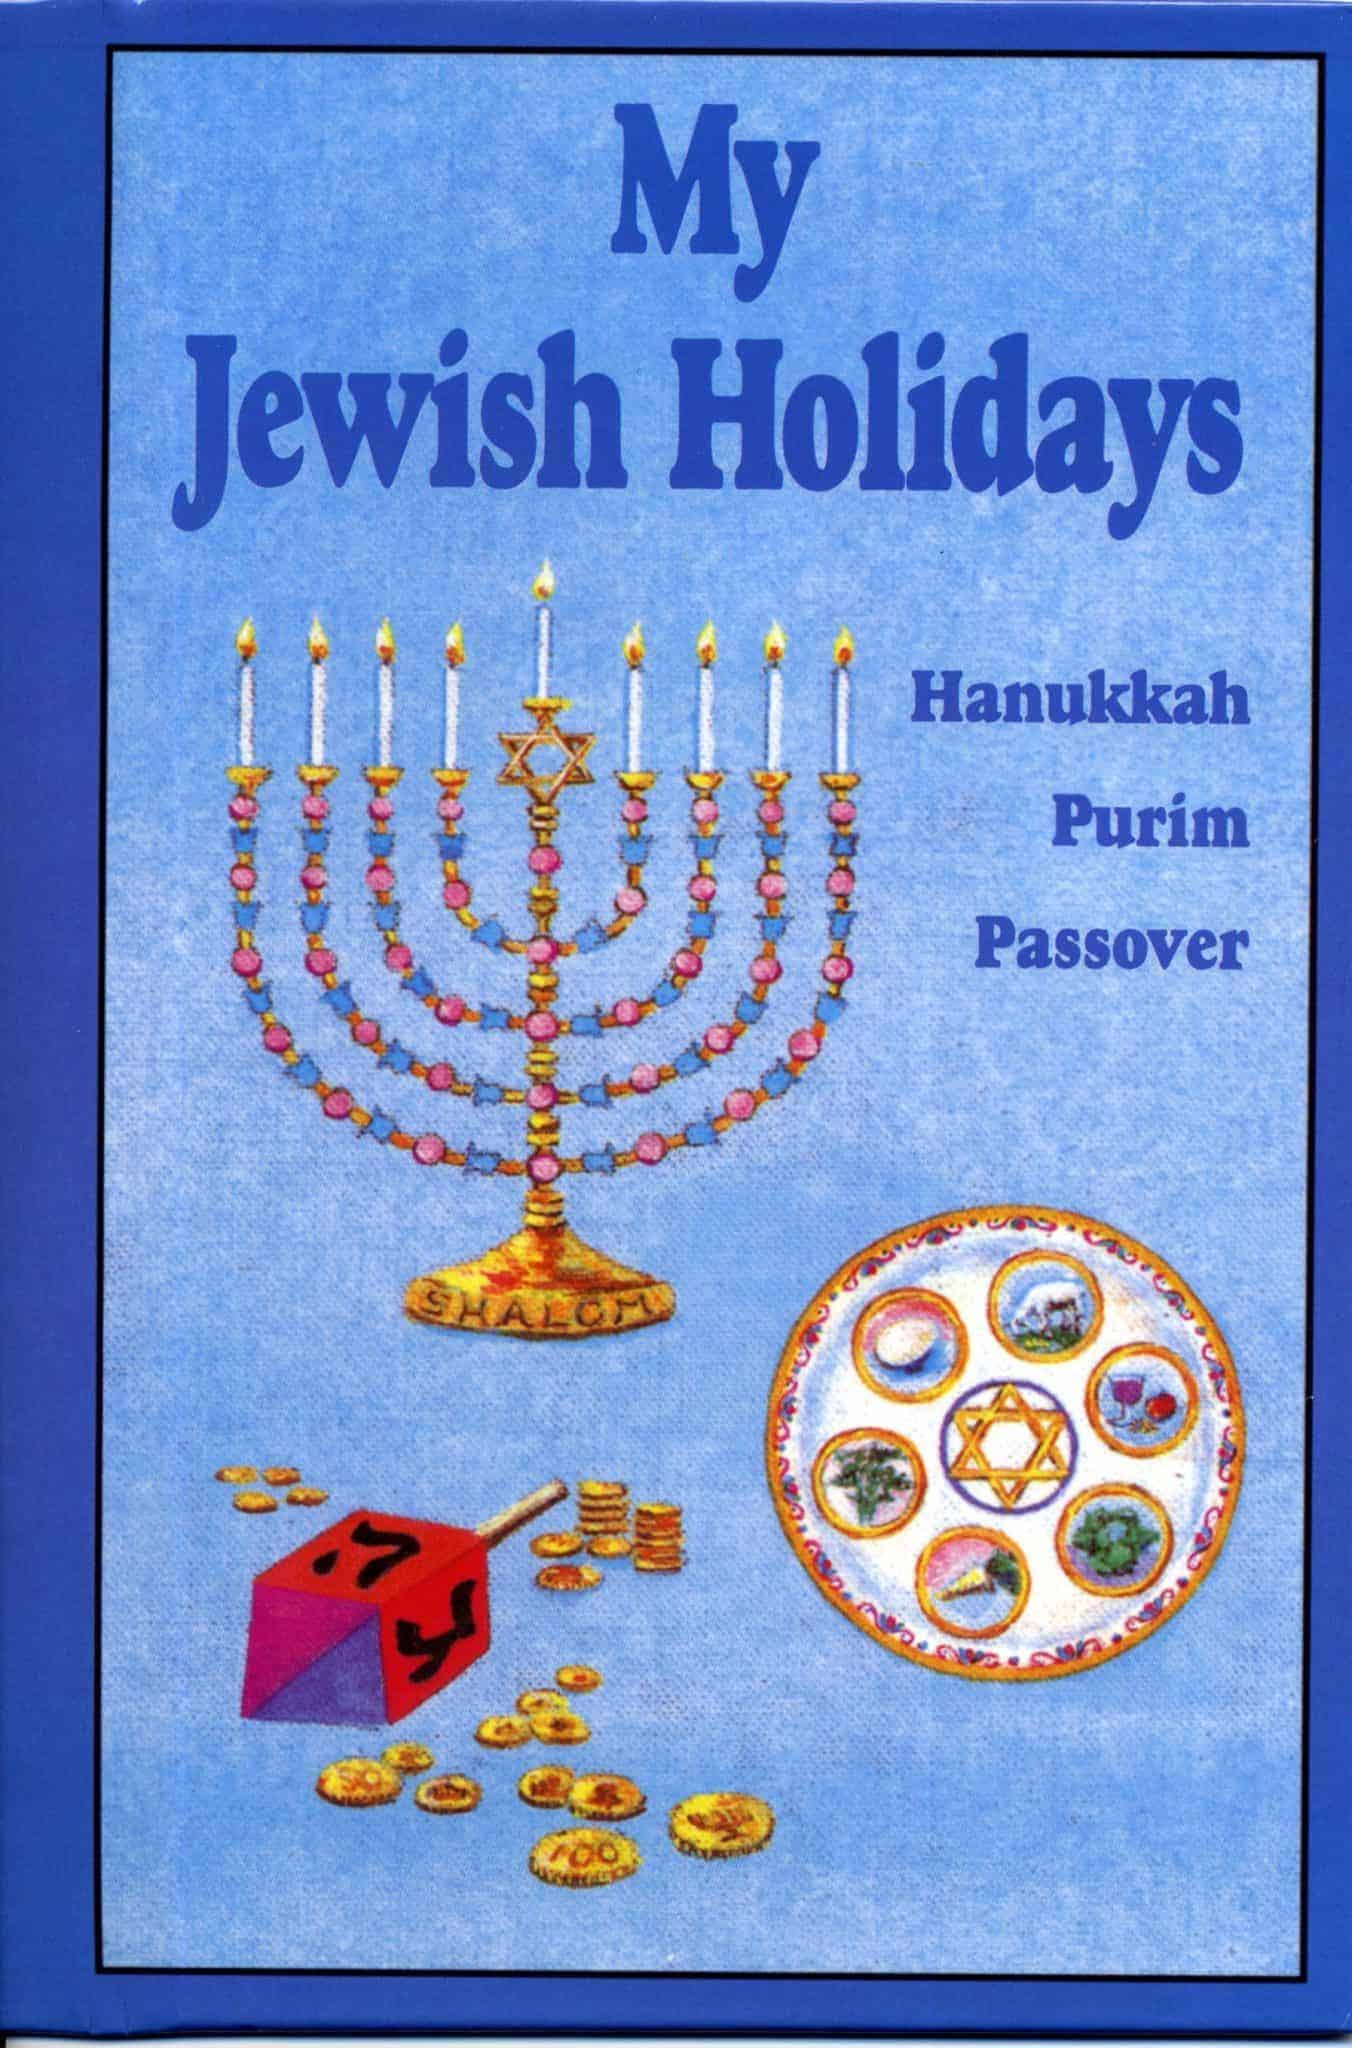 Jewish Holidays Personalized Book